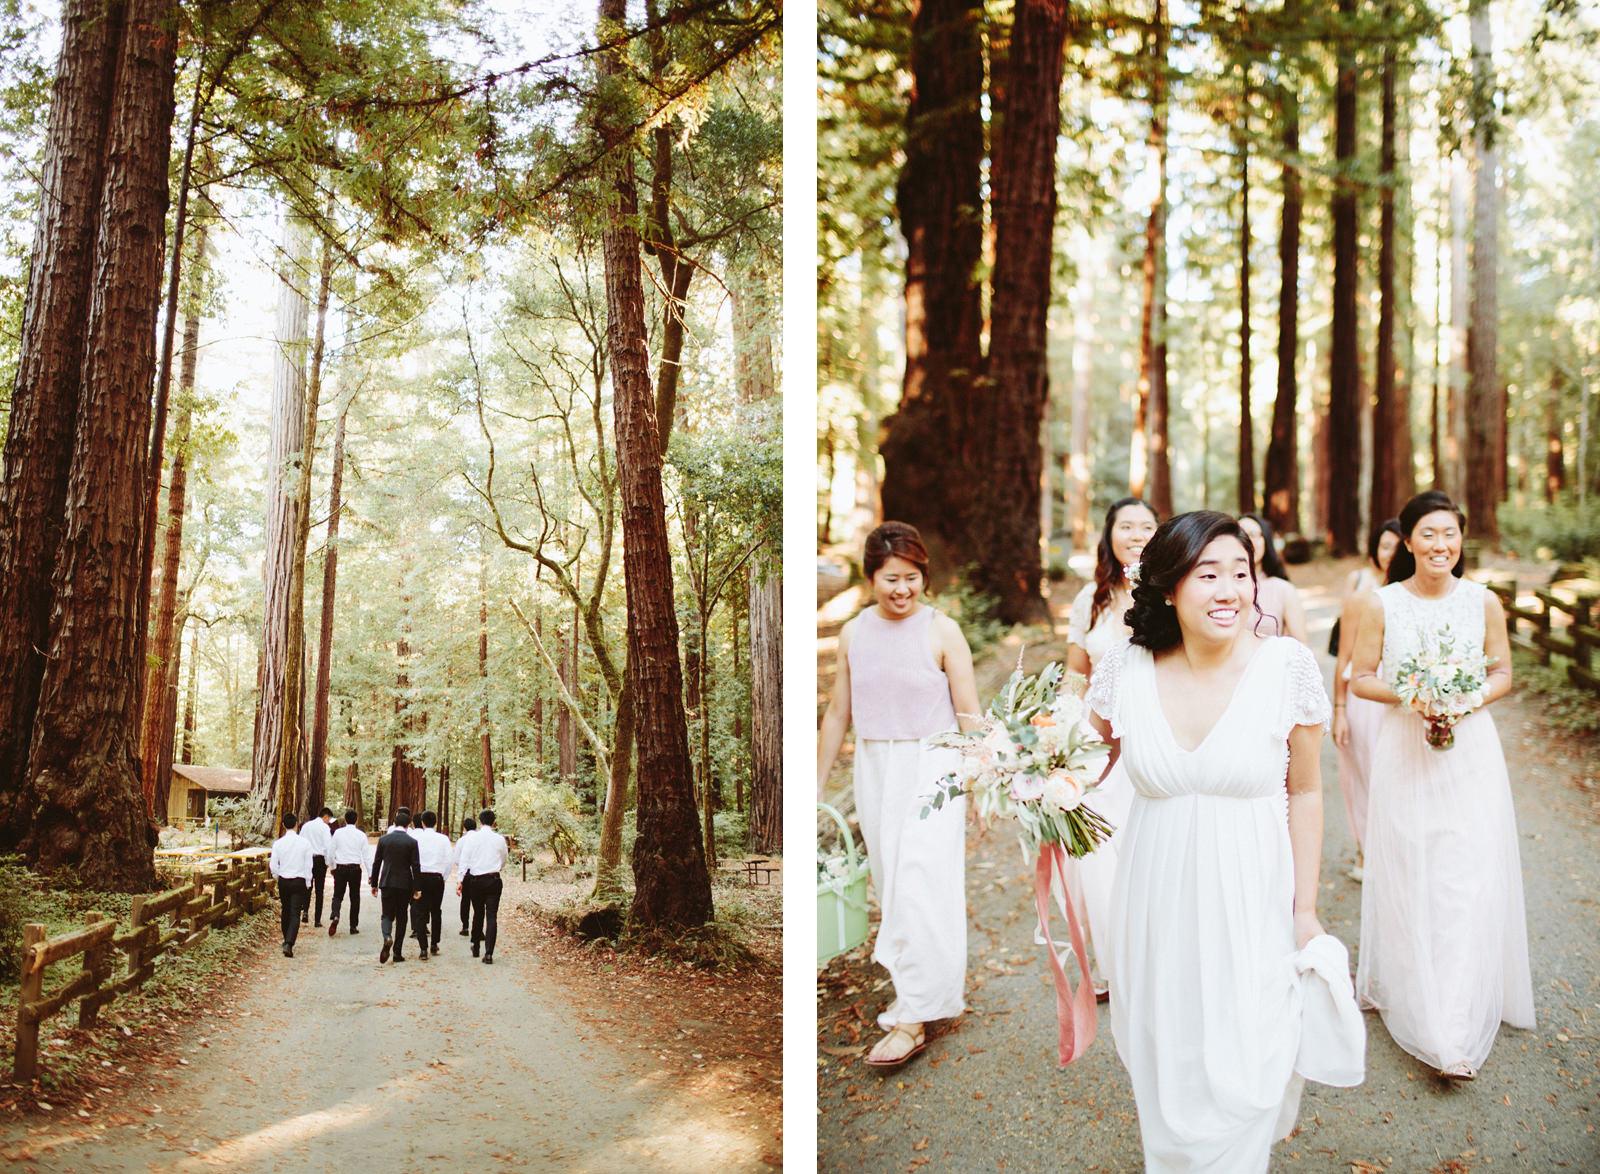 kimclay-blog-003 REDWOOD FOREST WEDDING